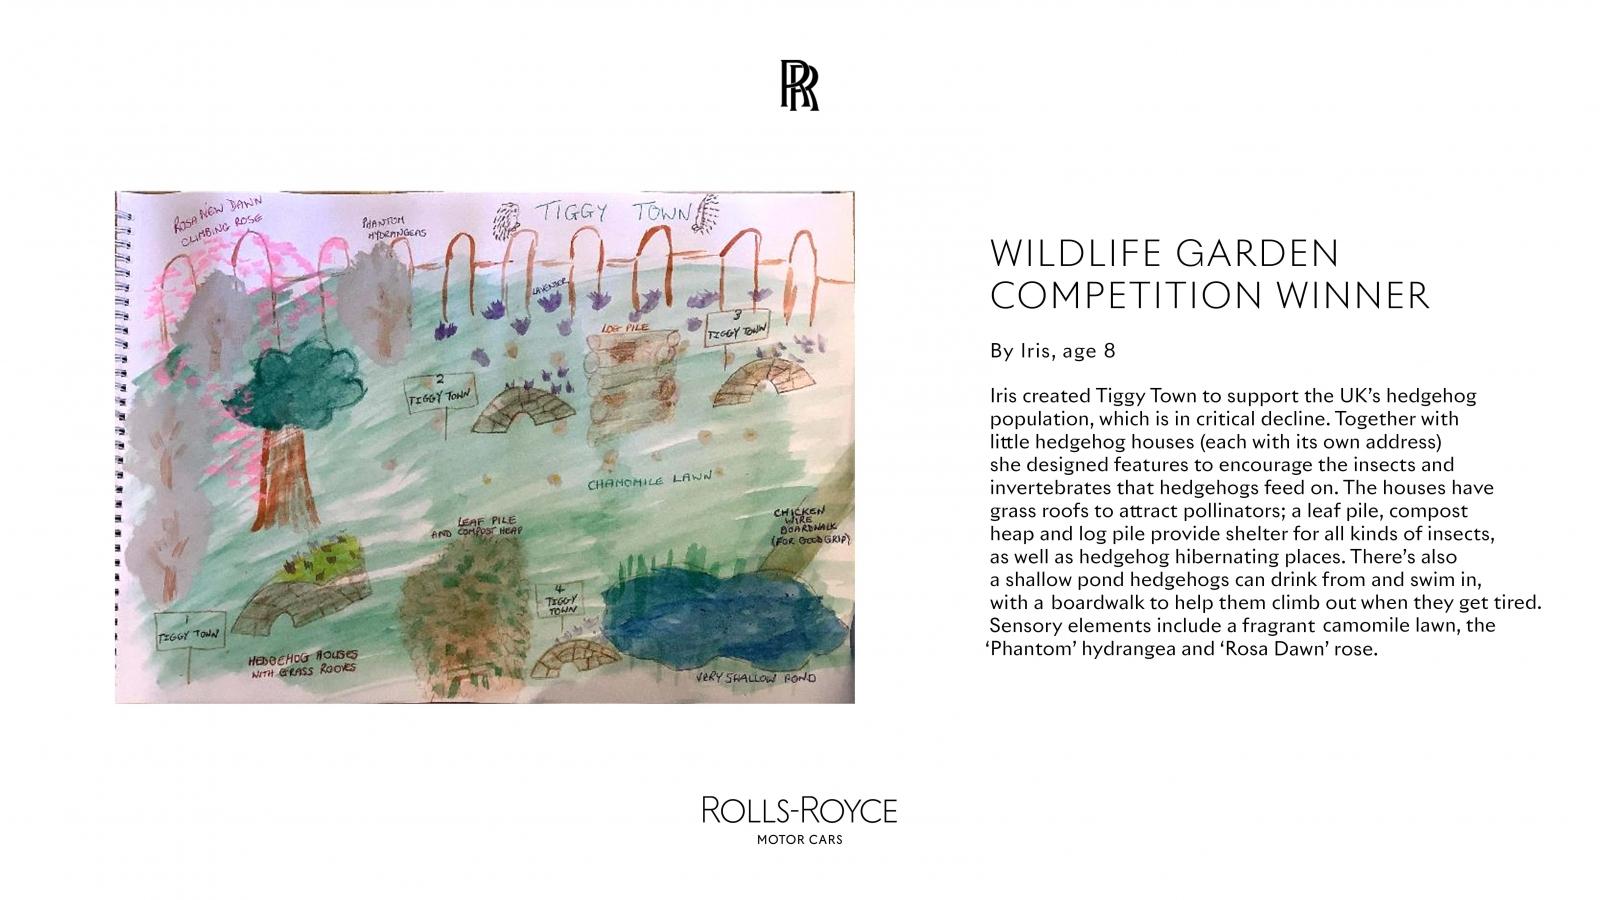 Rolls-Royce truyền cảm hứng cho trẻ em thông qua cuộc thi Wildlife Garden